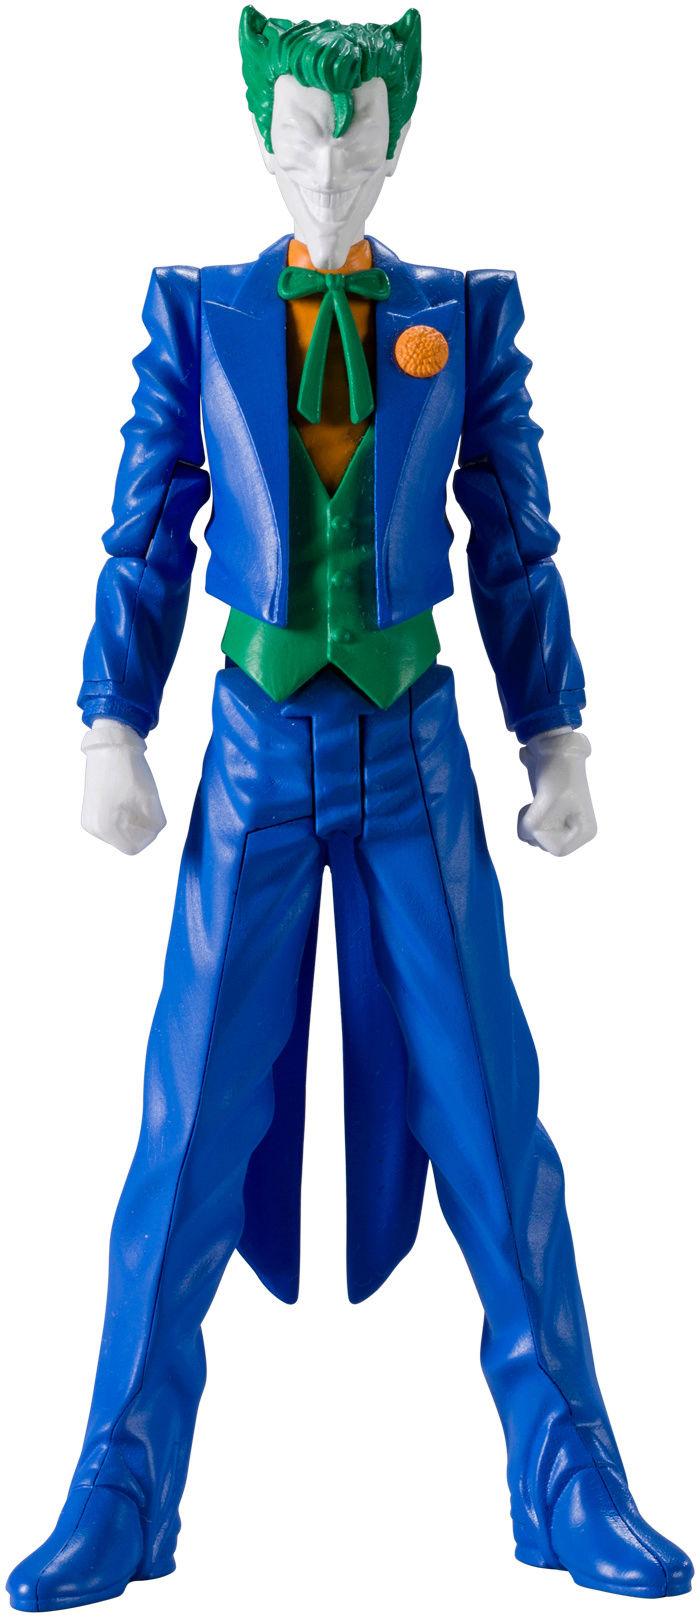 Original Comic The Joker - Level 1 (Sprukits-Bandai) Joker-14